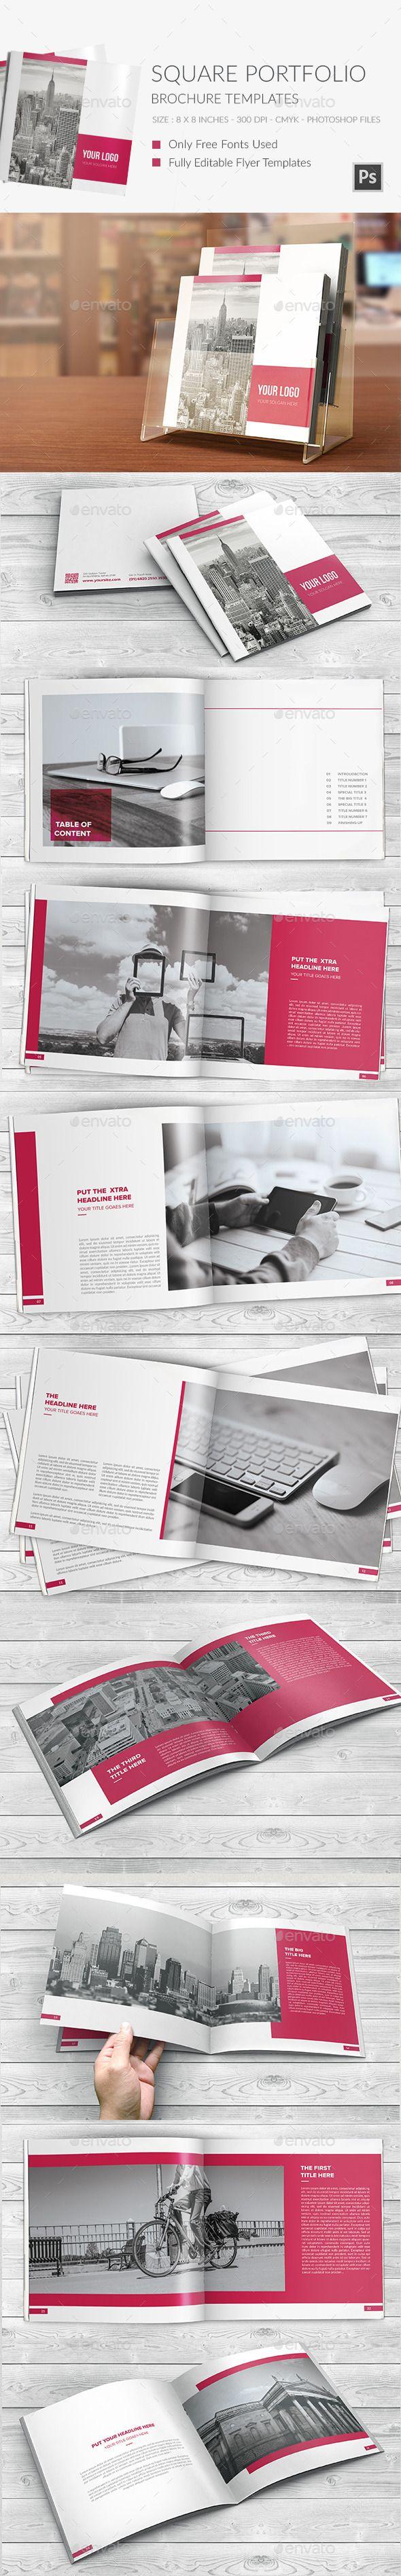 Square Portfolio Brochure Template #print #design Download: http://graphicriver.net/item/square-portfolio-brochure-template/12041279?ref=ksioks